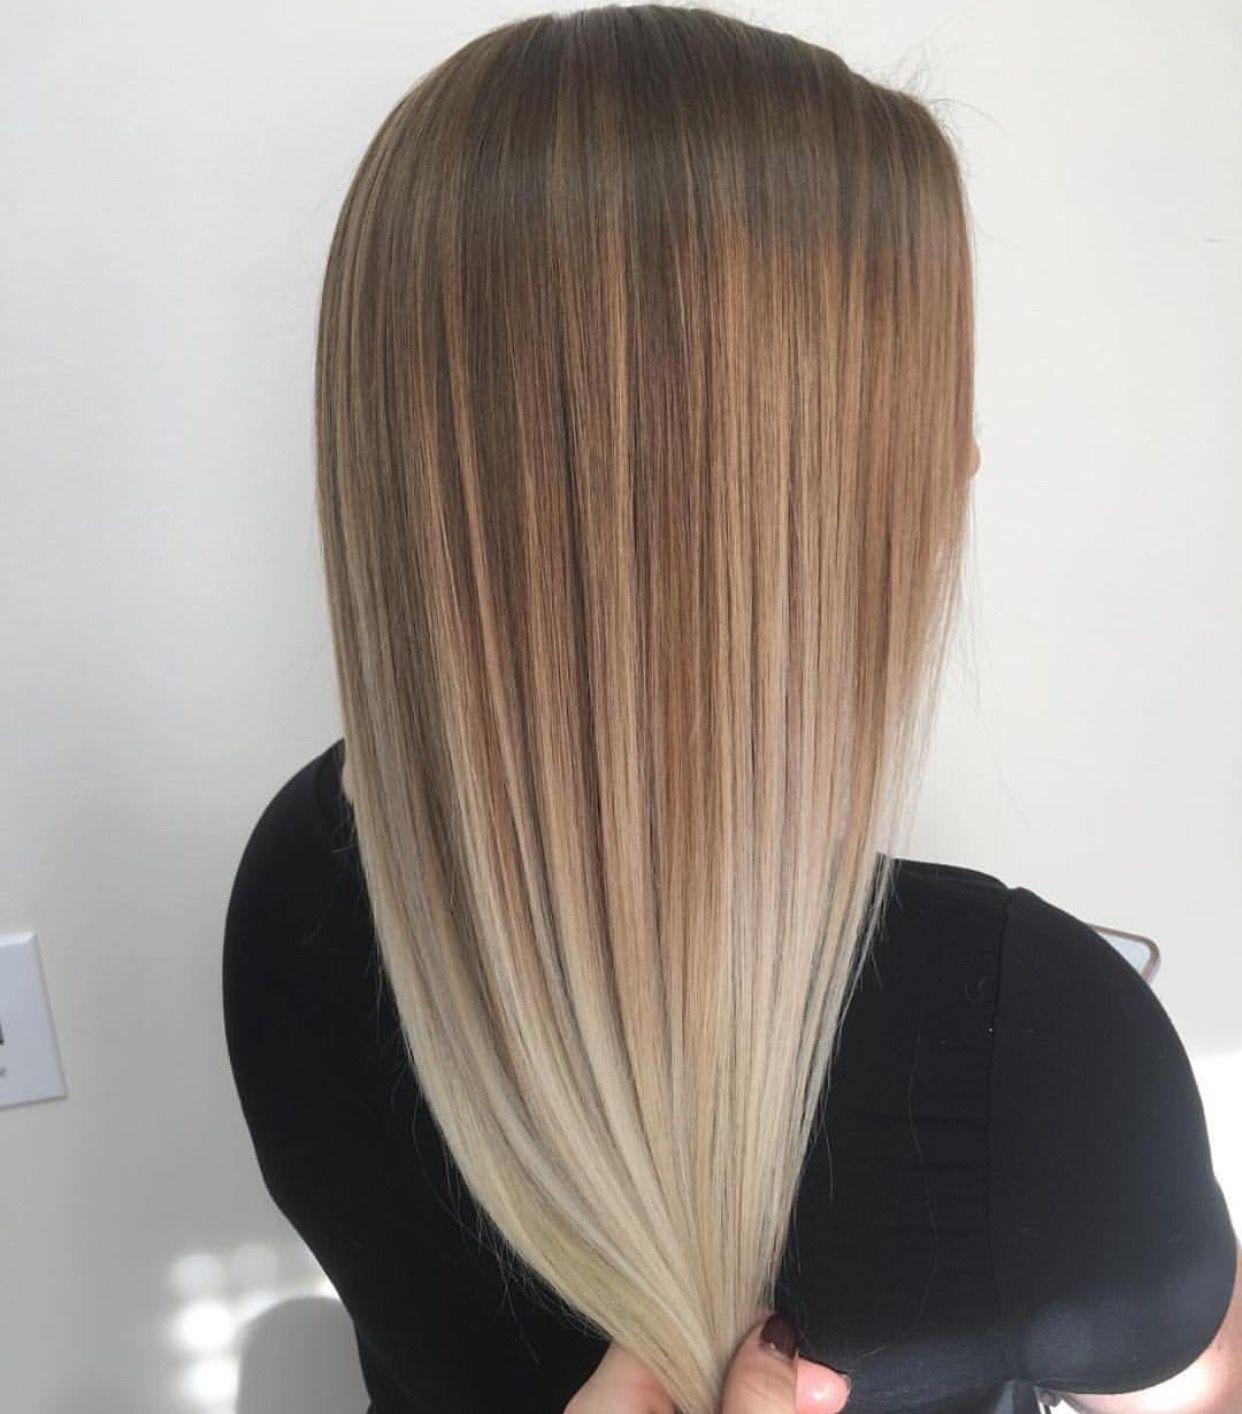 Balayage Chloedebus Balayage Straight Hair Balayage Hair Blonde Color Melting Hair